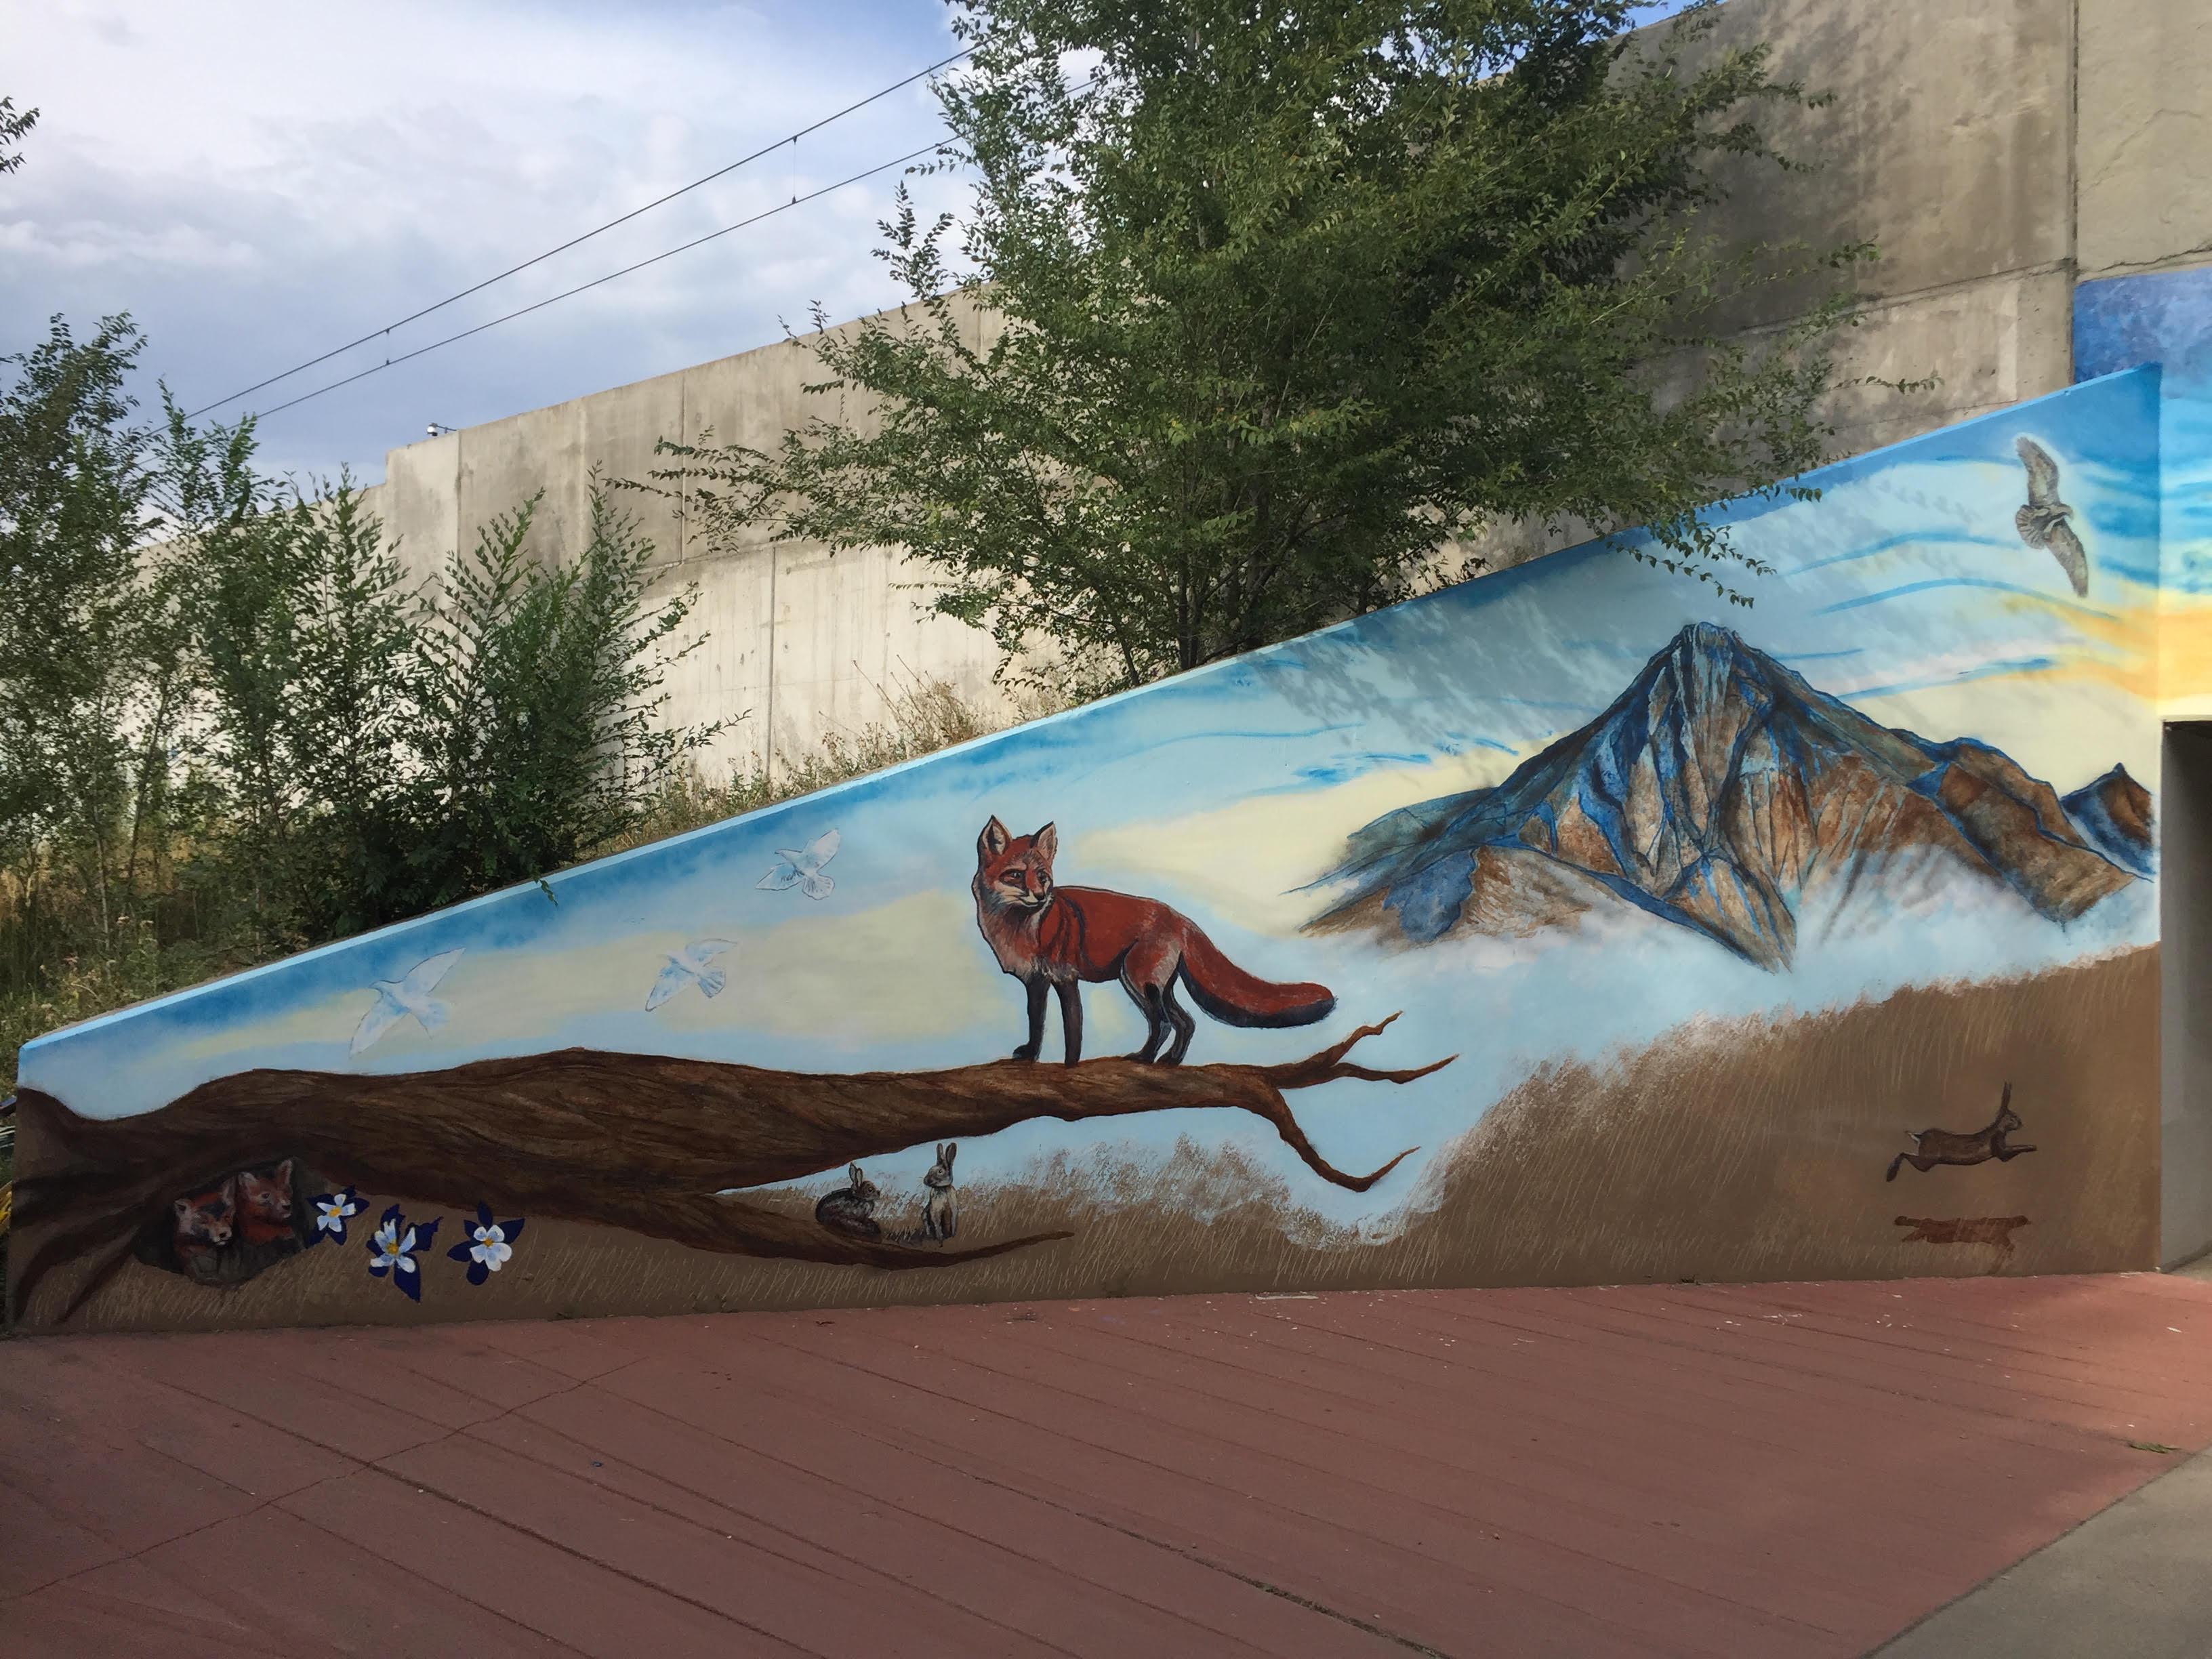 Go to the Rocky Mountain Majesty page